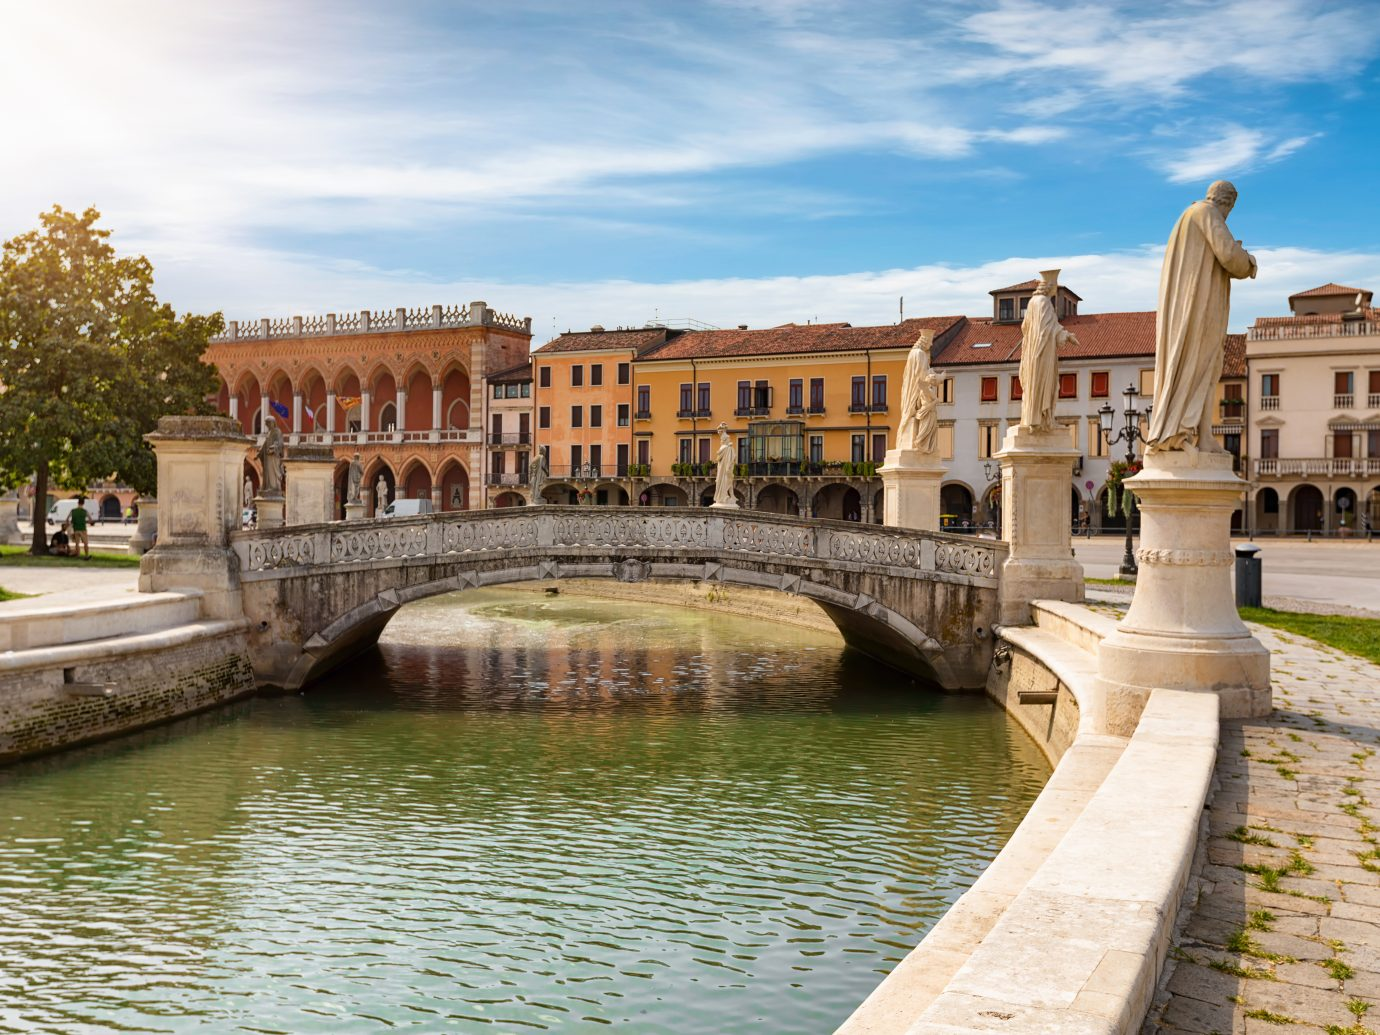 The Prato della Valle Square in Padova, Italy, with it`s canals and bridges